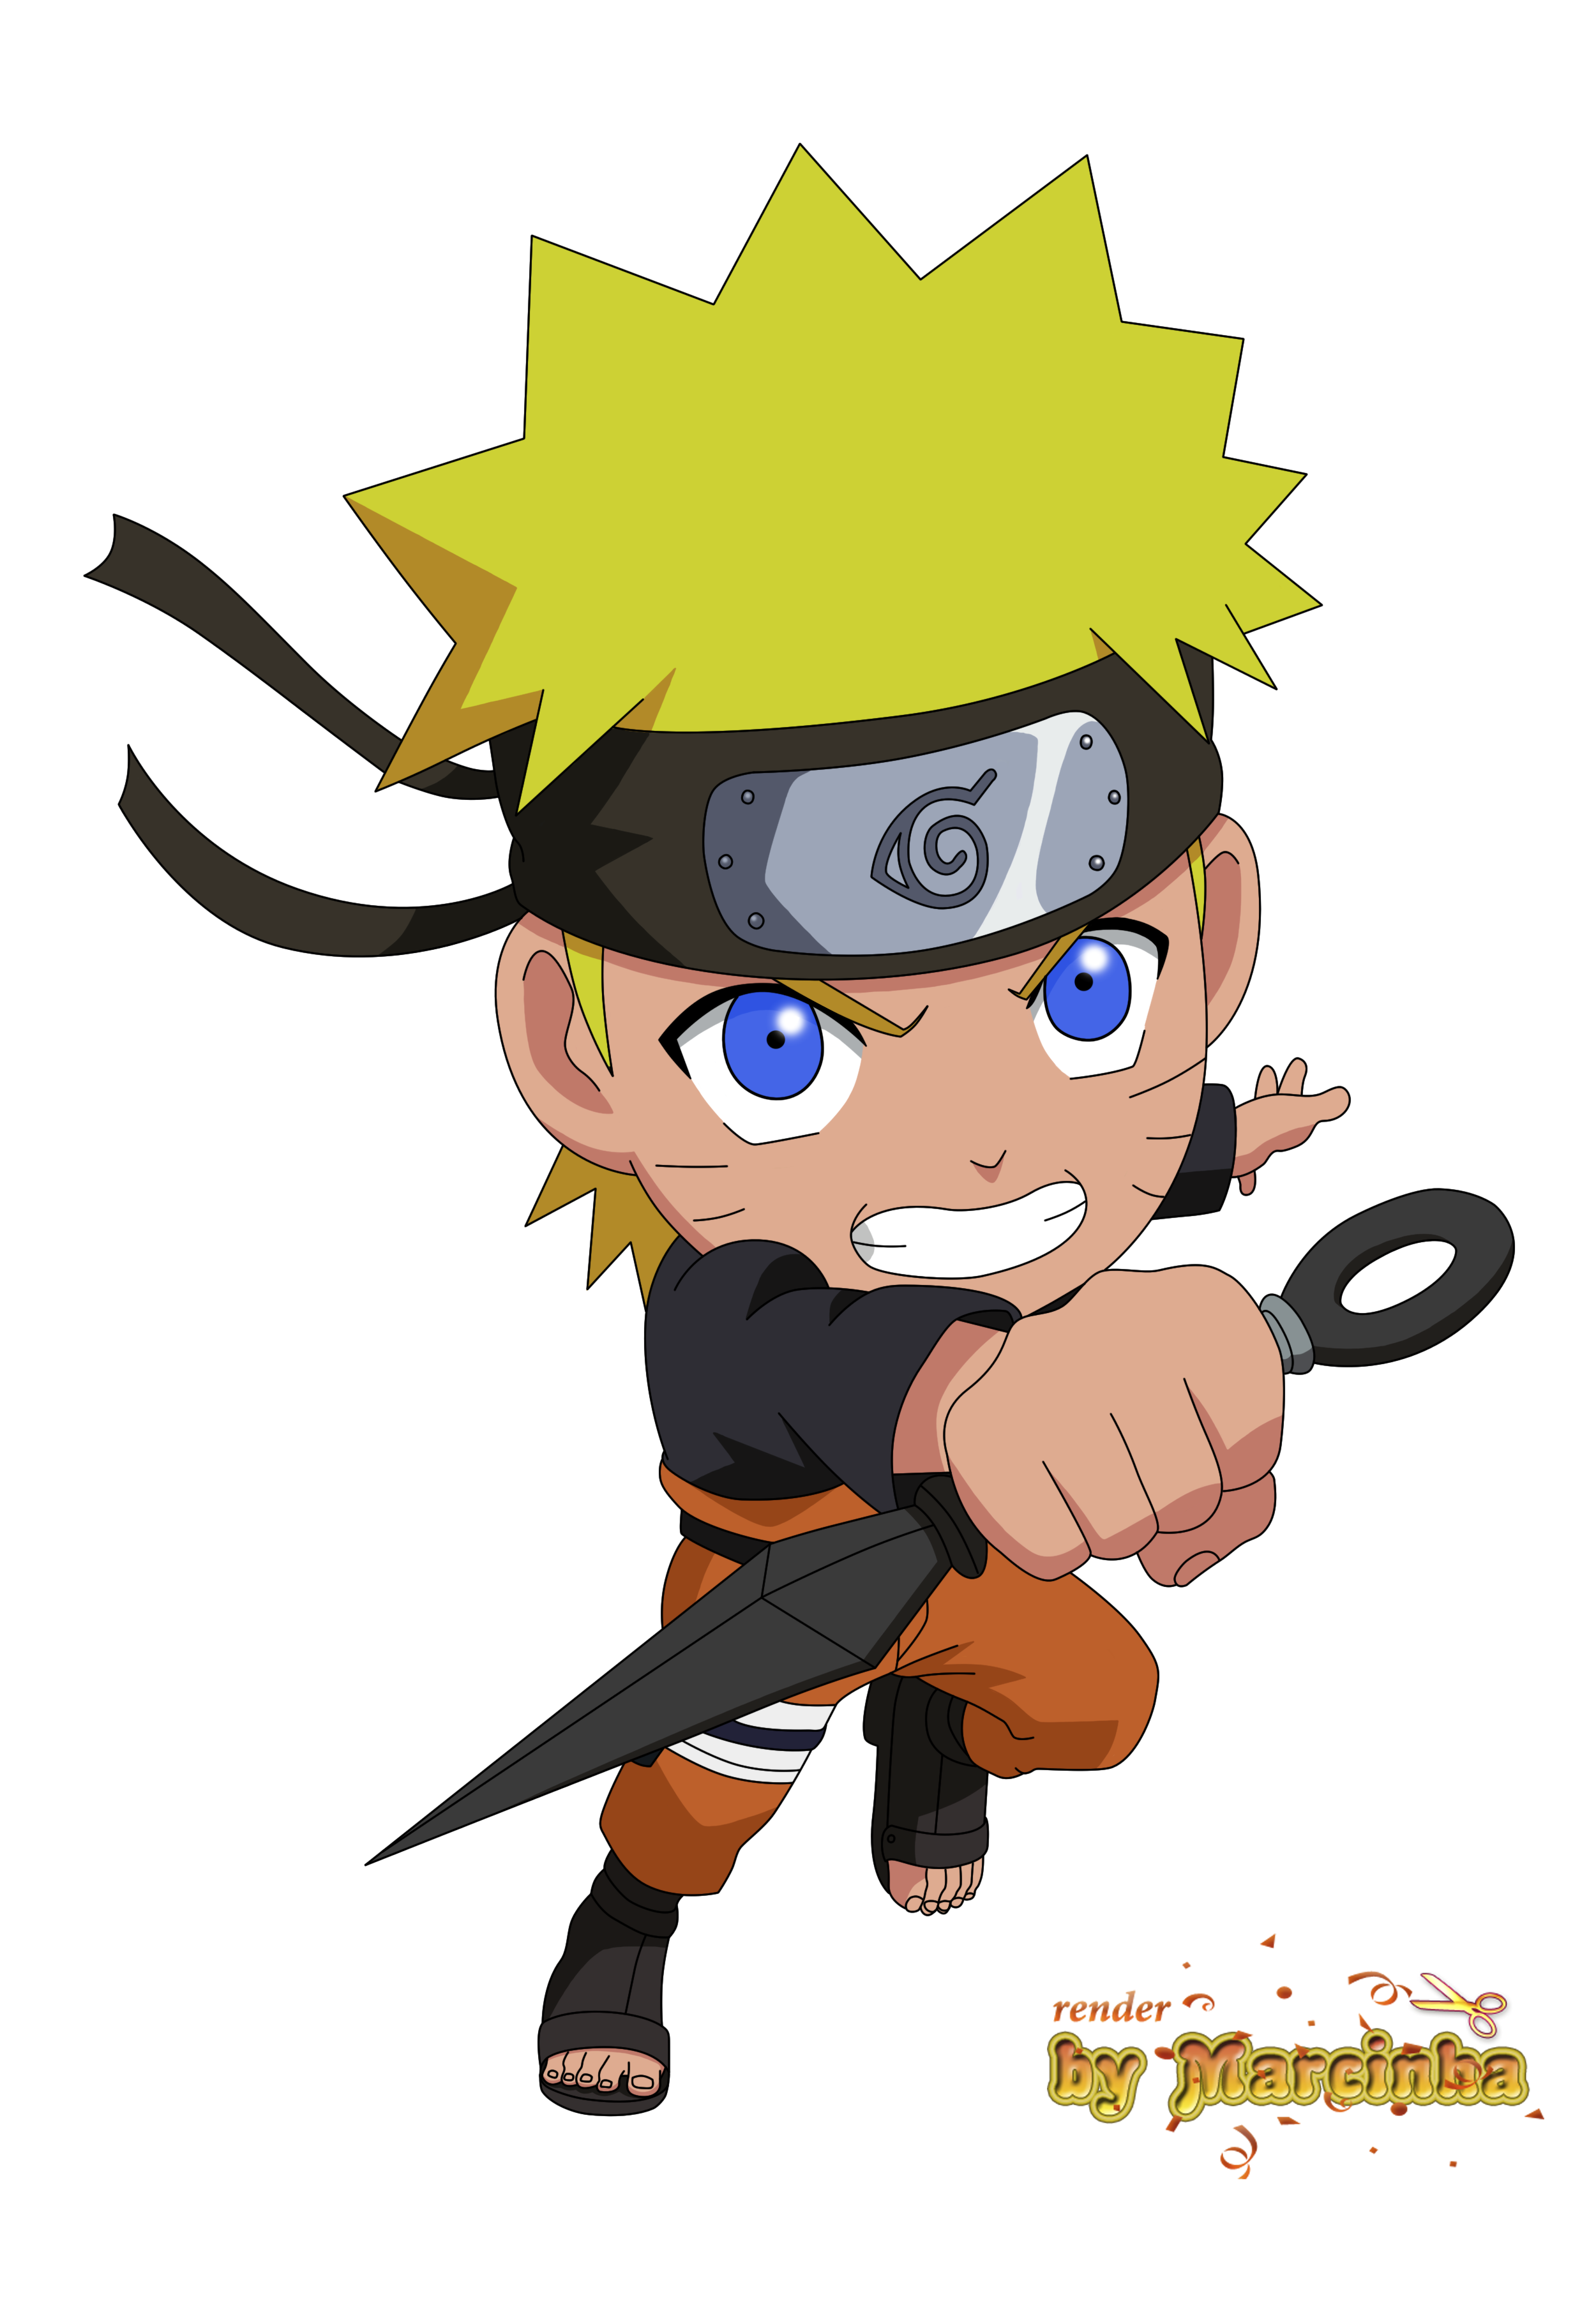 Png Chibi Naruto Shippuden Personagens Chibi Festa Infantil Naruto Chibi